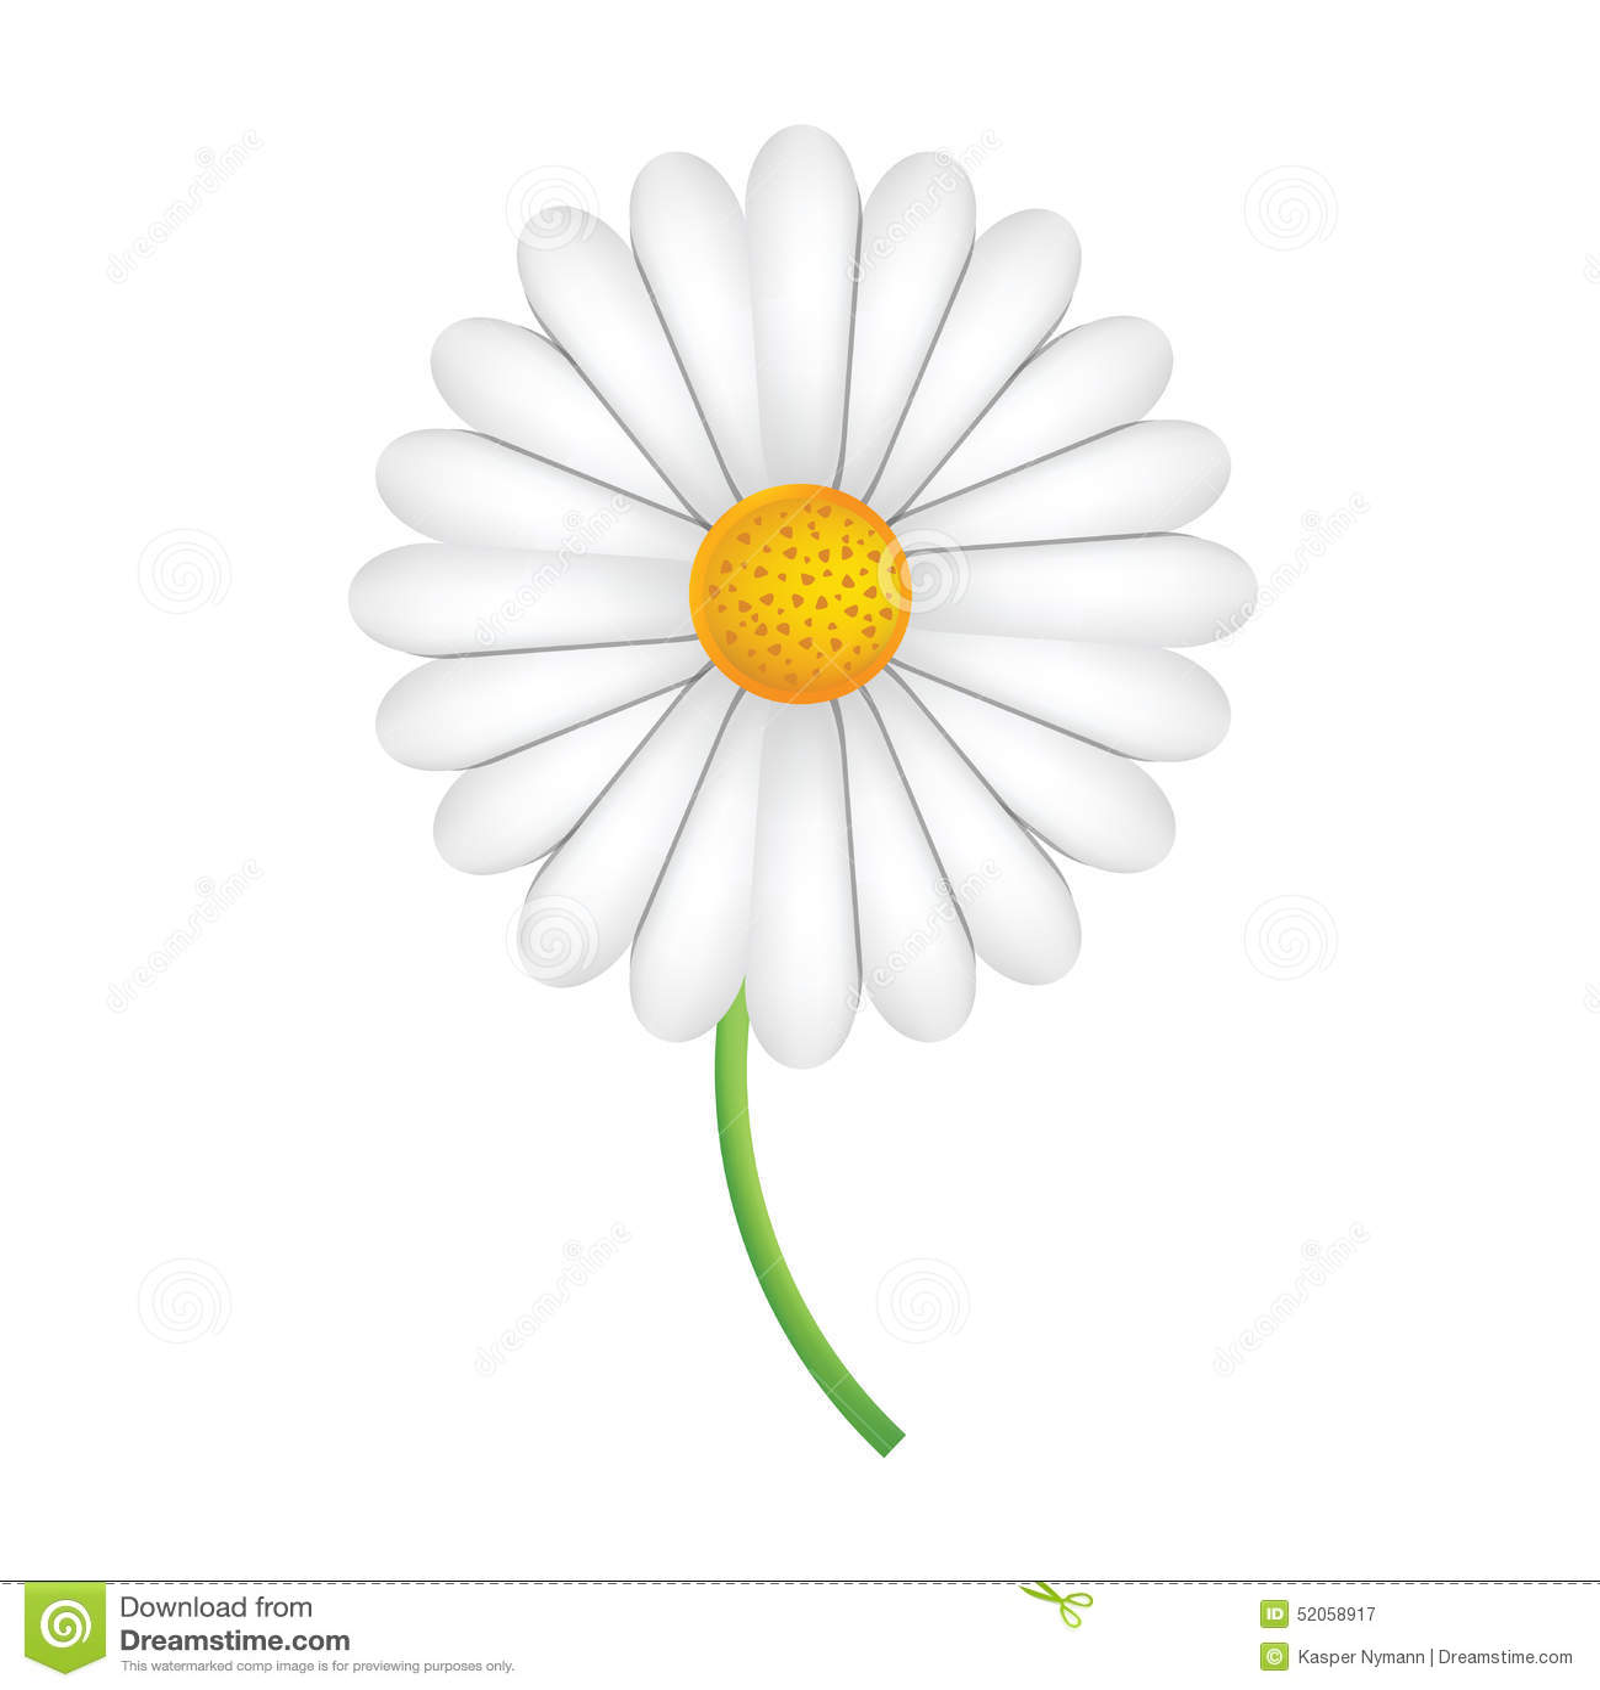 fleur blanche de marguerite des pr s sur une tige verte illustration stock image 52058917. Black Bedroom Furniture Sets. Home Design Ideas